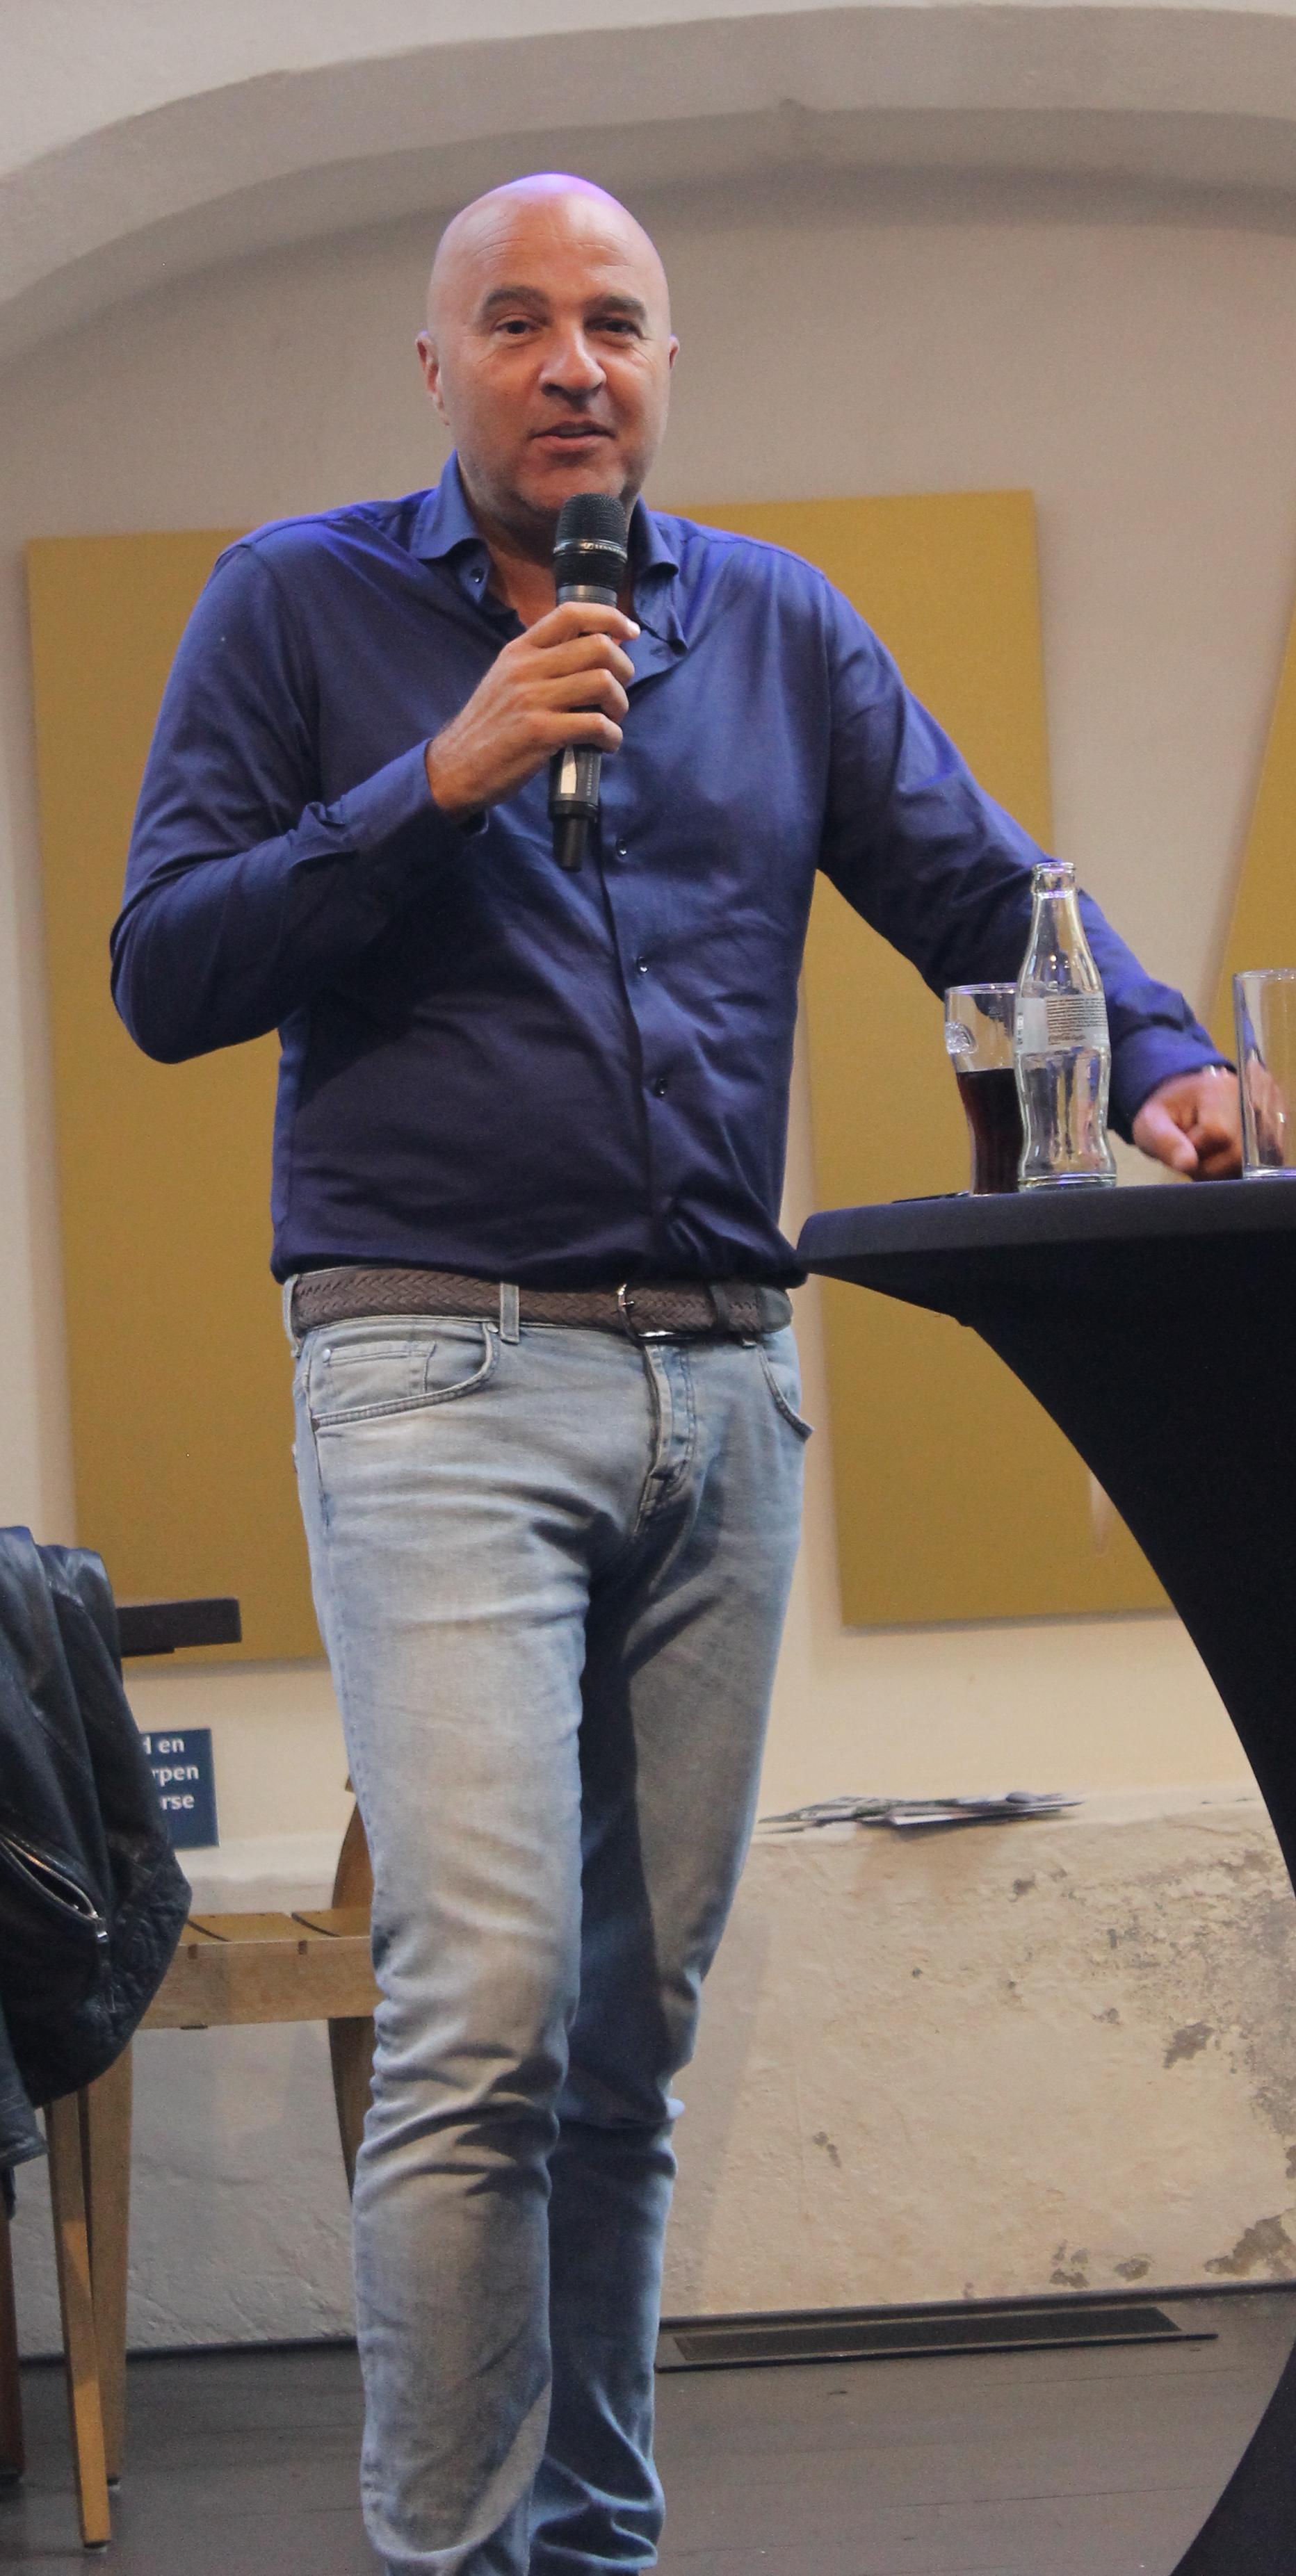 John Van Den Heuvel Wikipedia